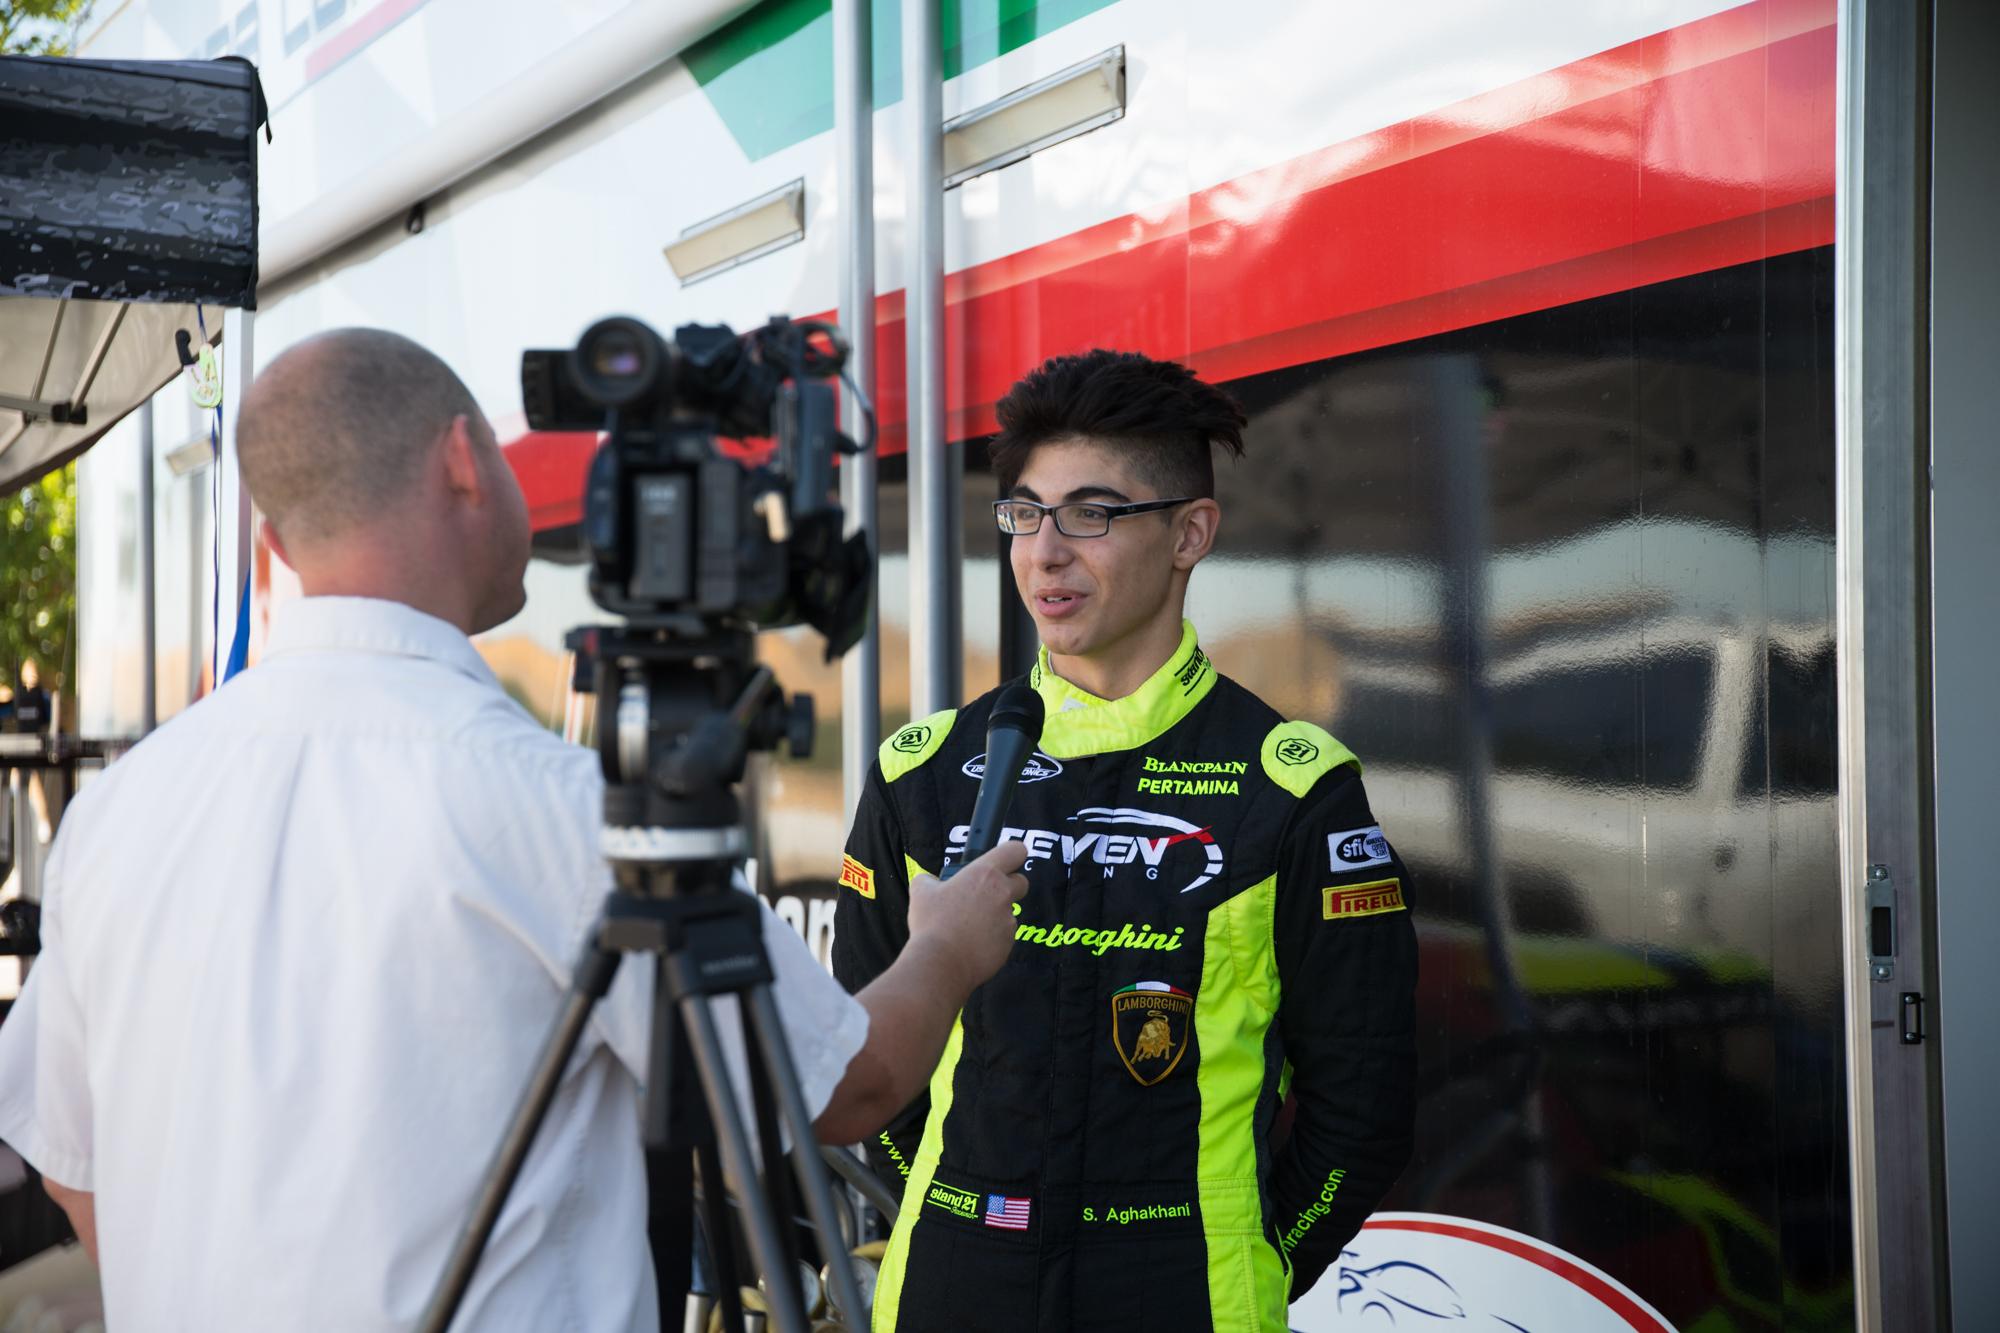 Steven-Racing-20171006-45068.jpg